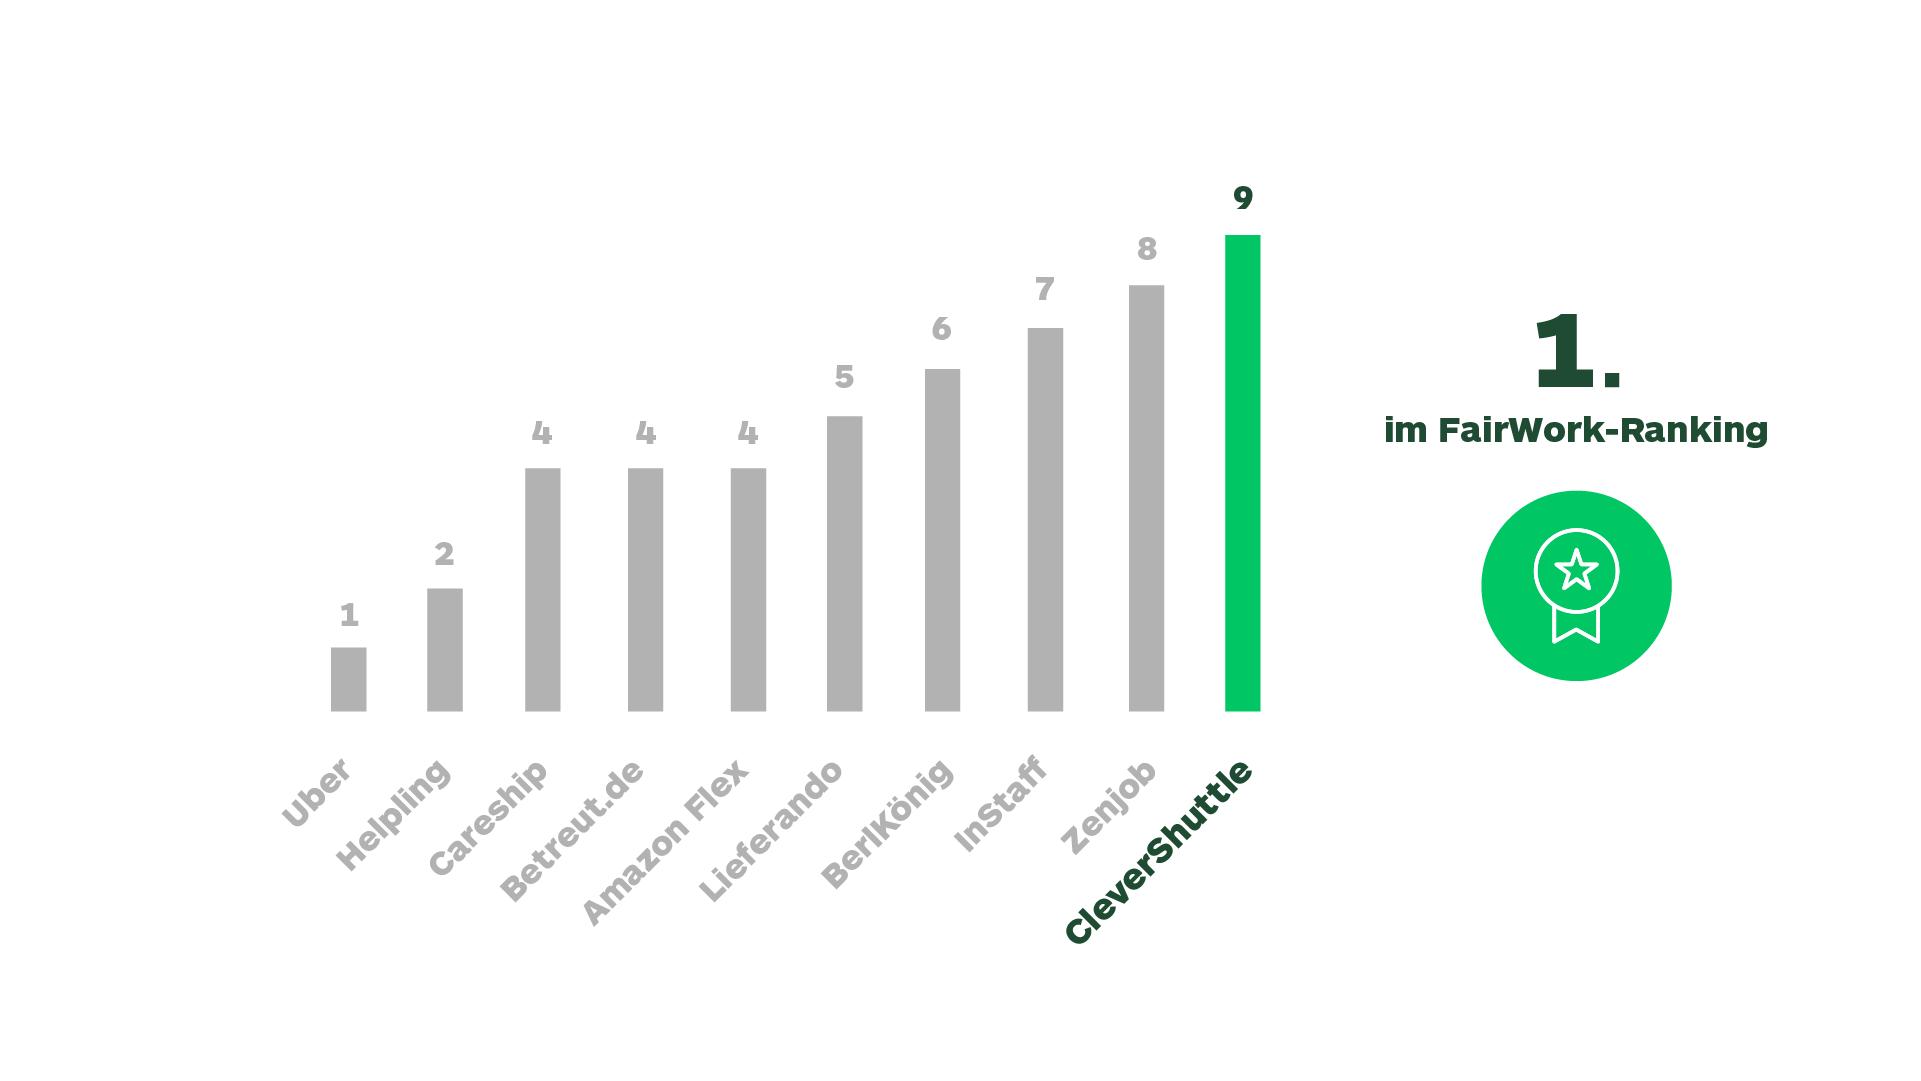 Fairwork Ranking